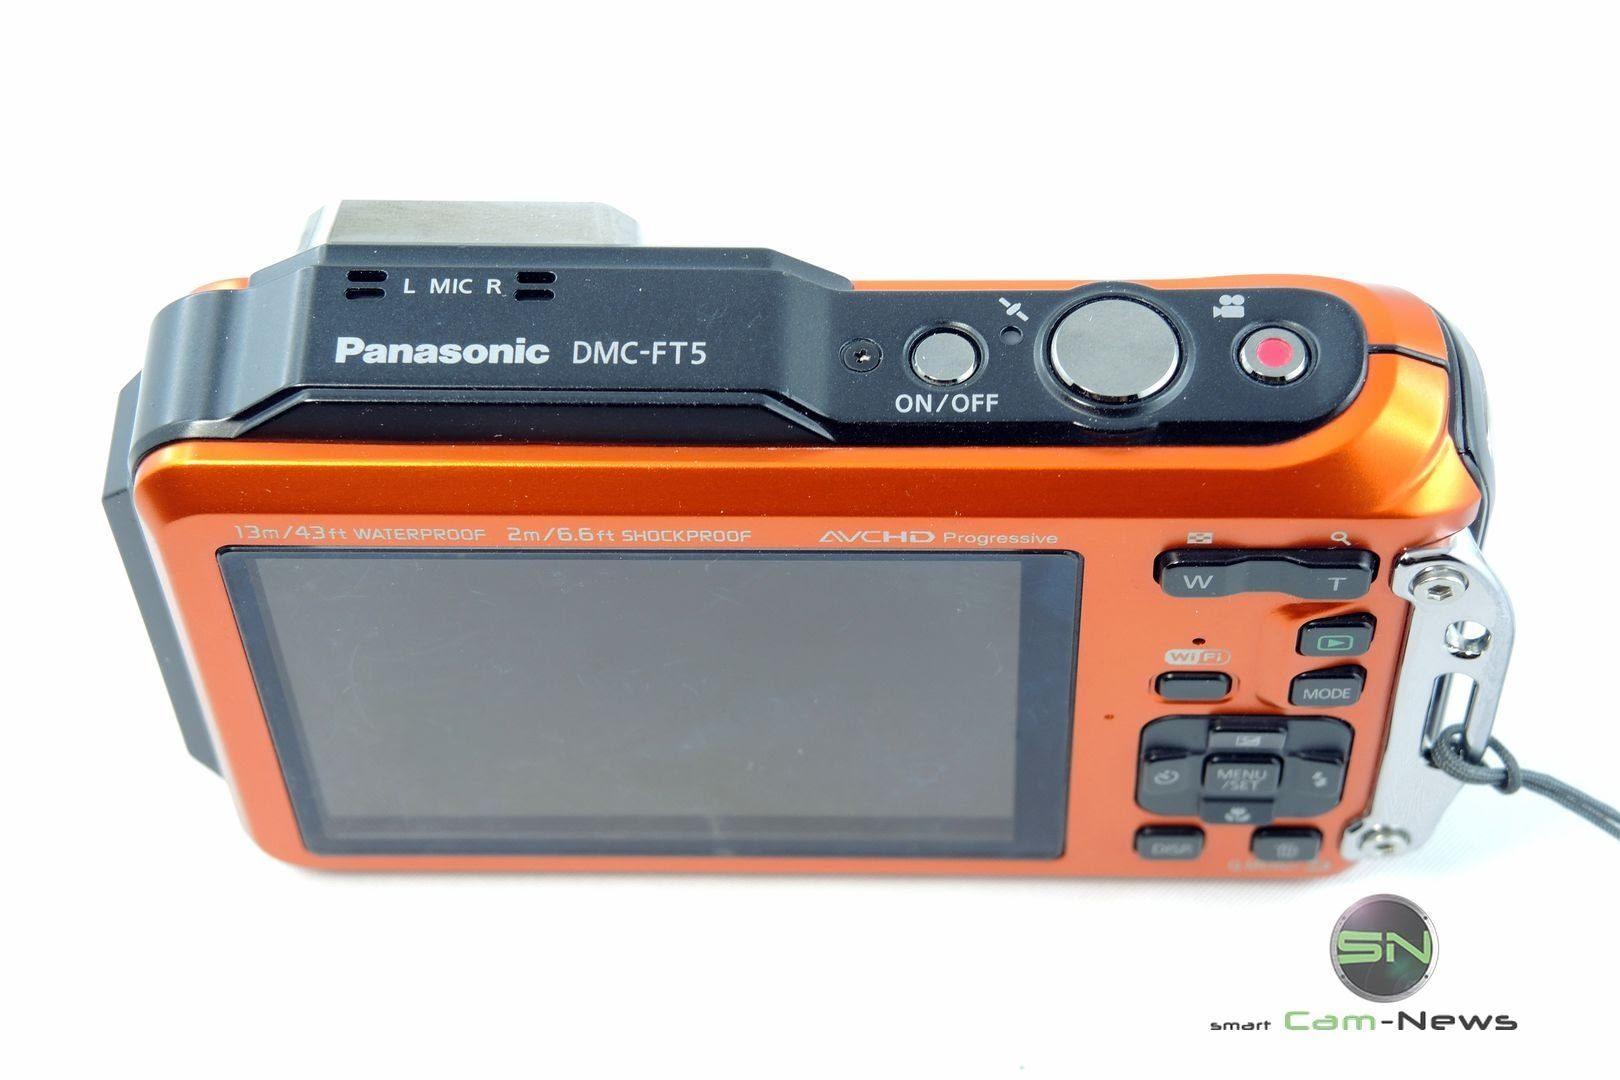 Bedienelemente Panasonic DMC-FT5 - SmartCamNews